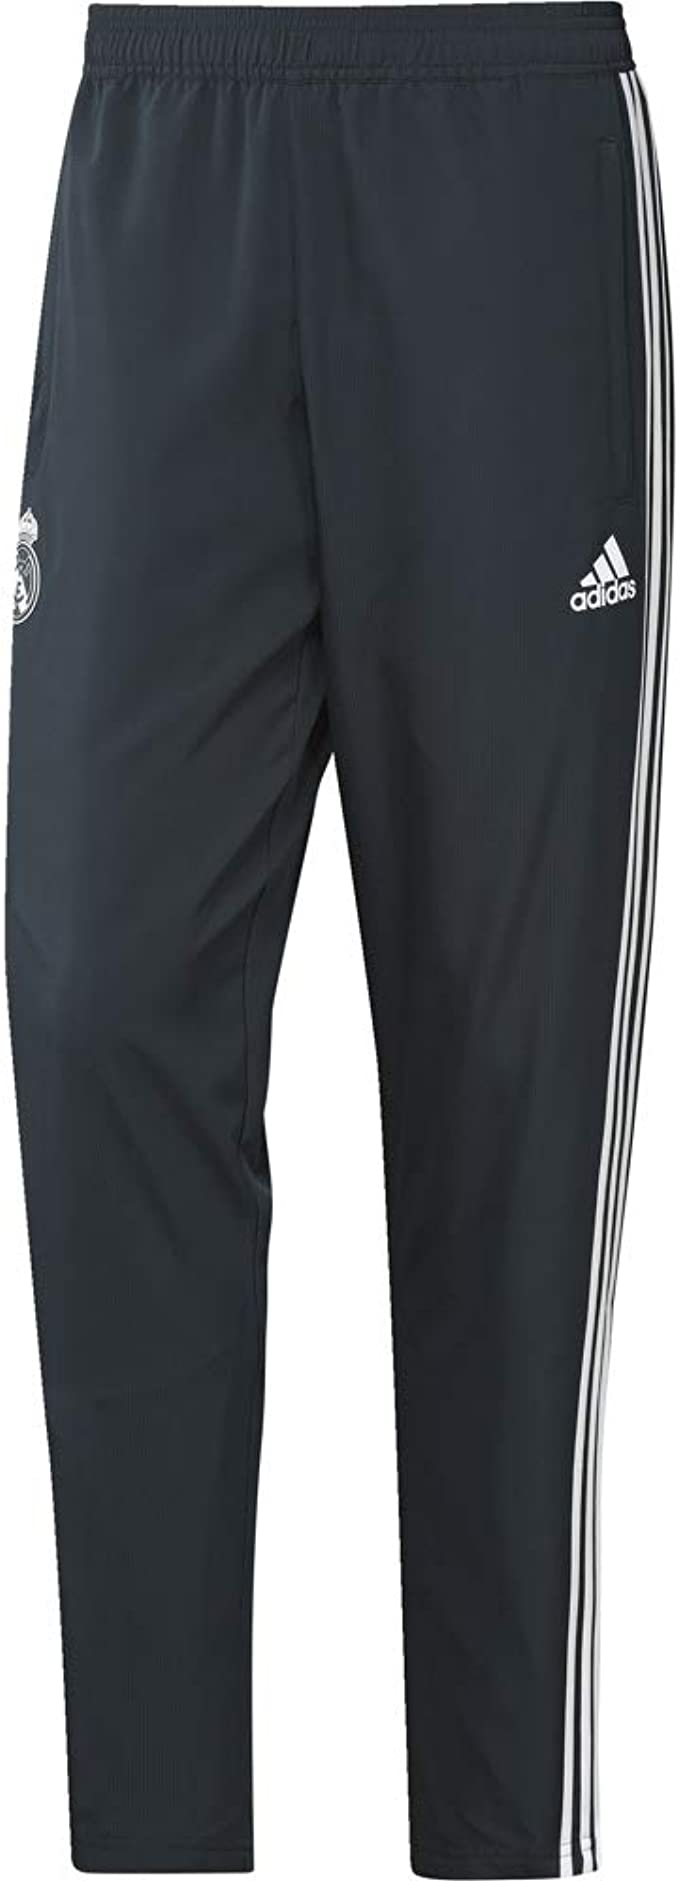 Adidas Condivo 20 Fussball Jacke Set Herren Damen 2 teilig